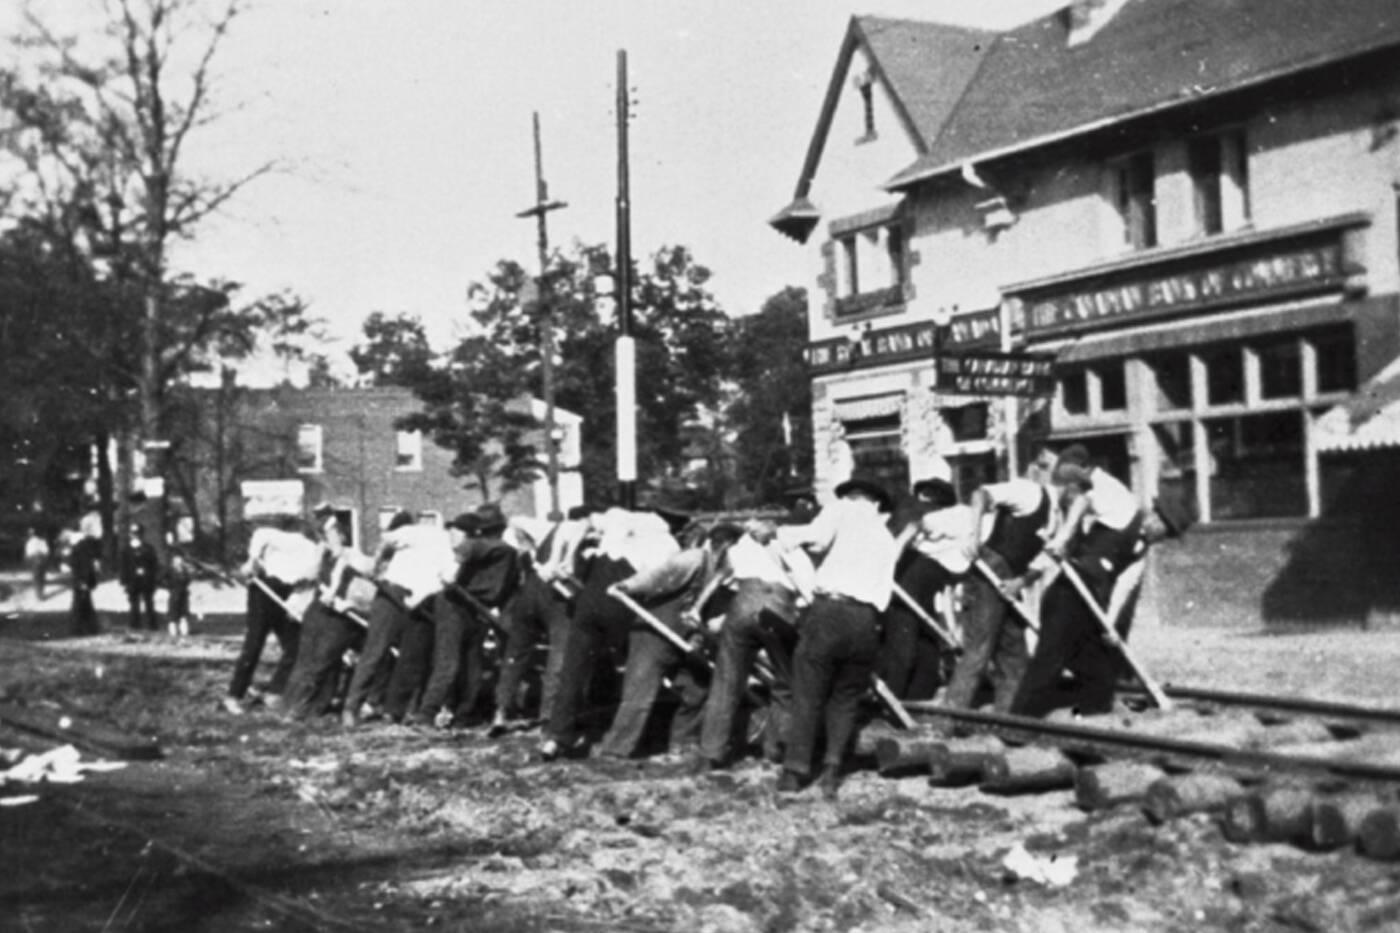 The history of Bloor West Village in Toronto